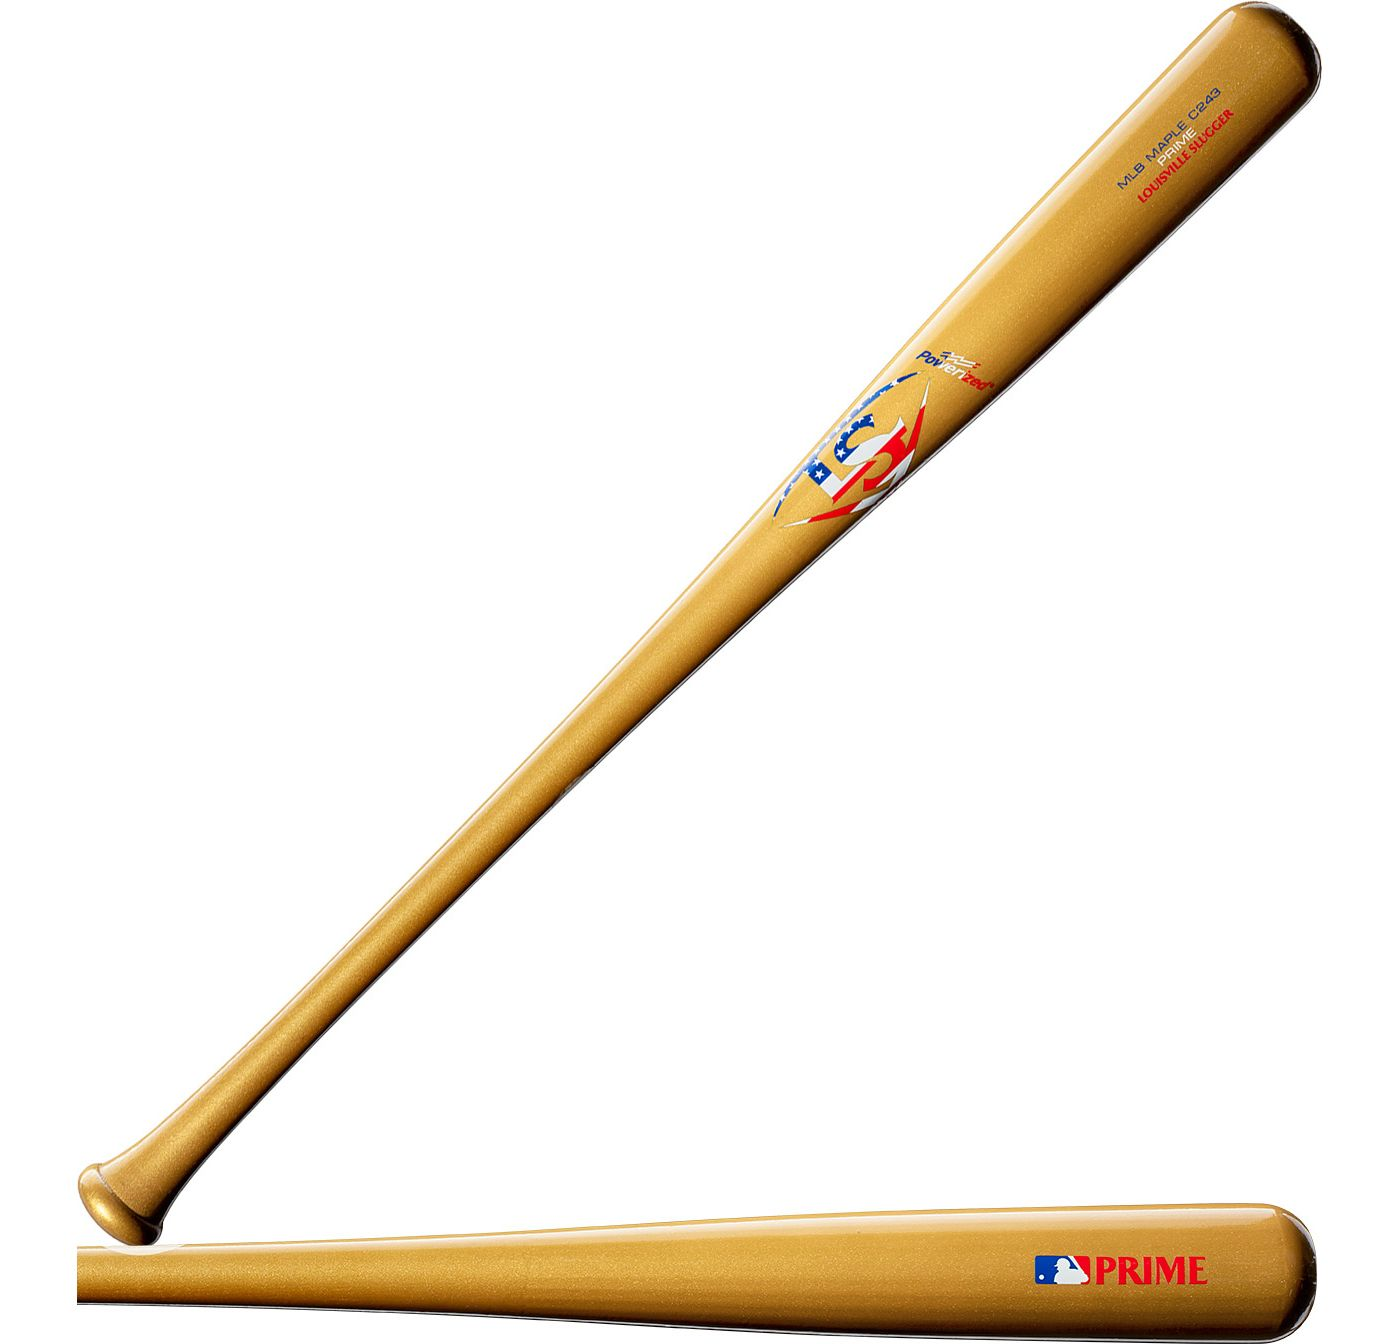 Louisville Slugger MLB Prime C243 Maple Bat